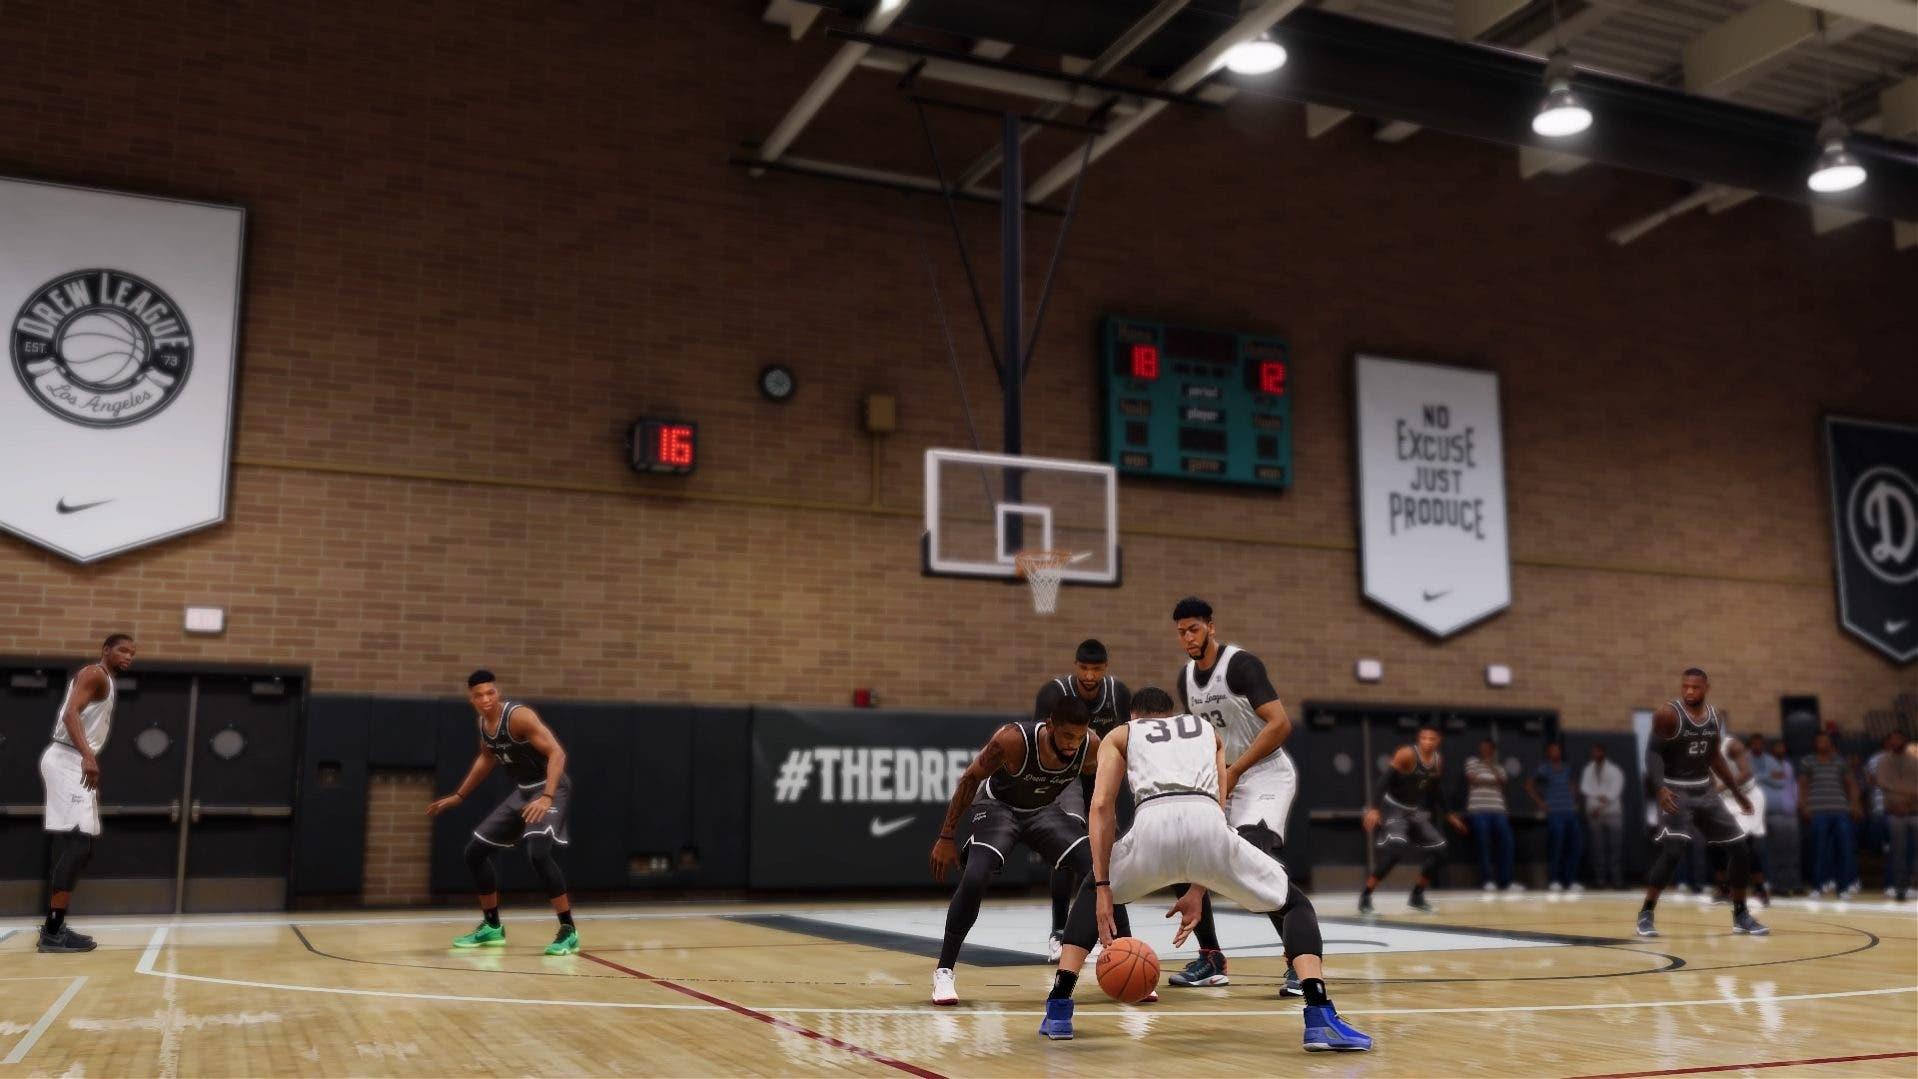 Imagen de Análisis NBA Live 18